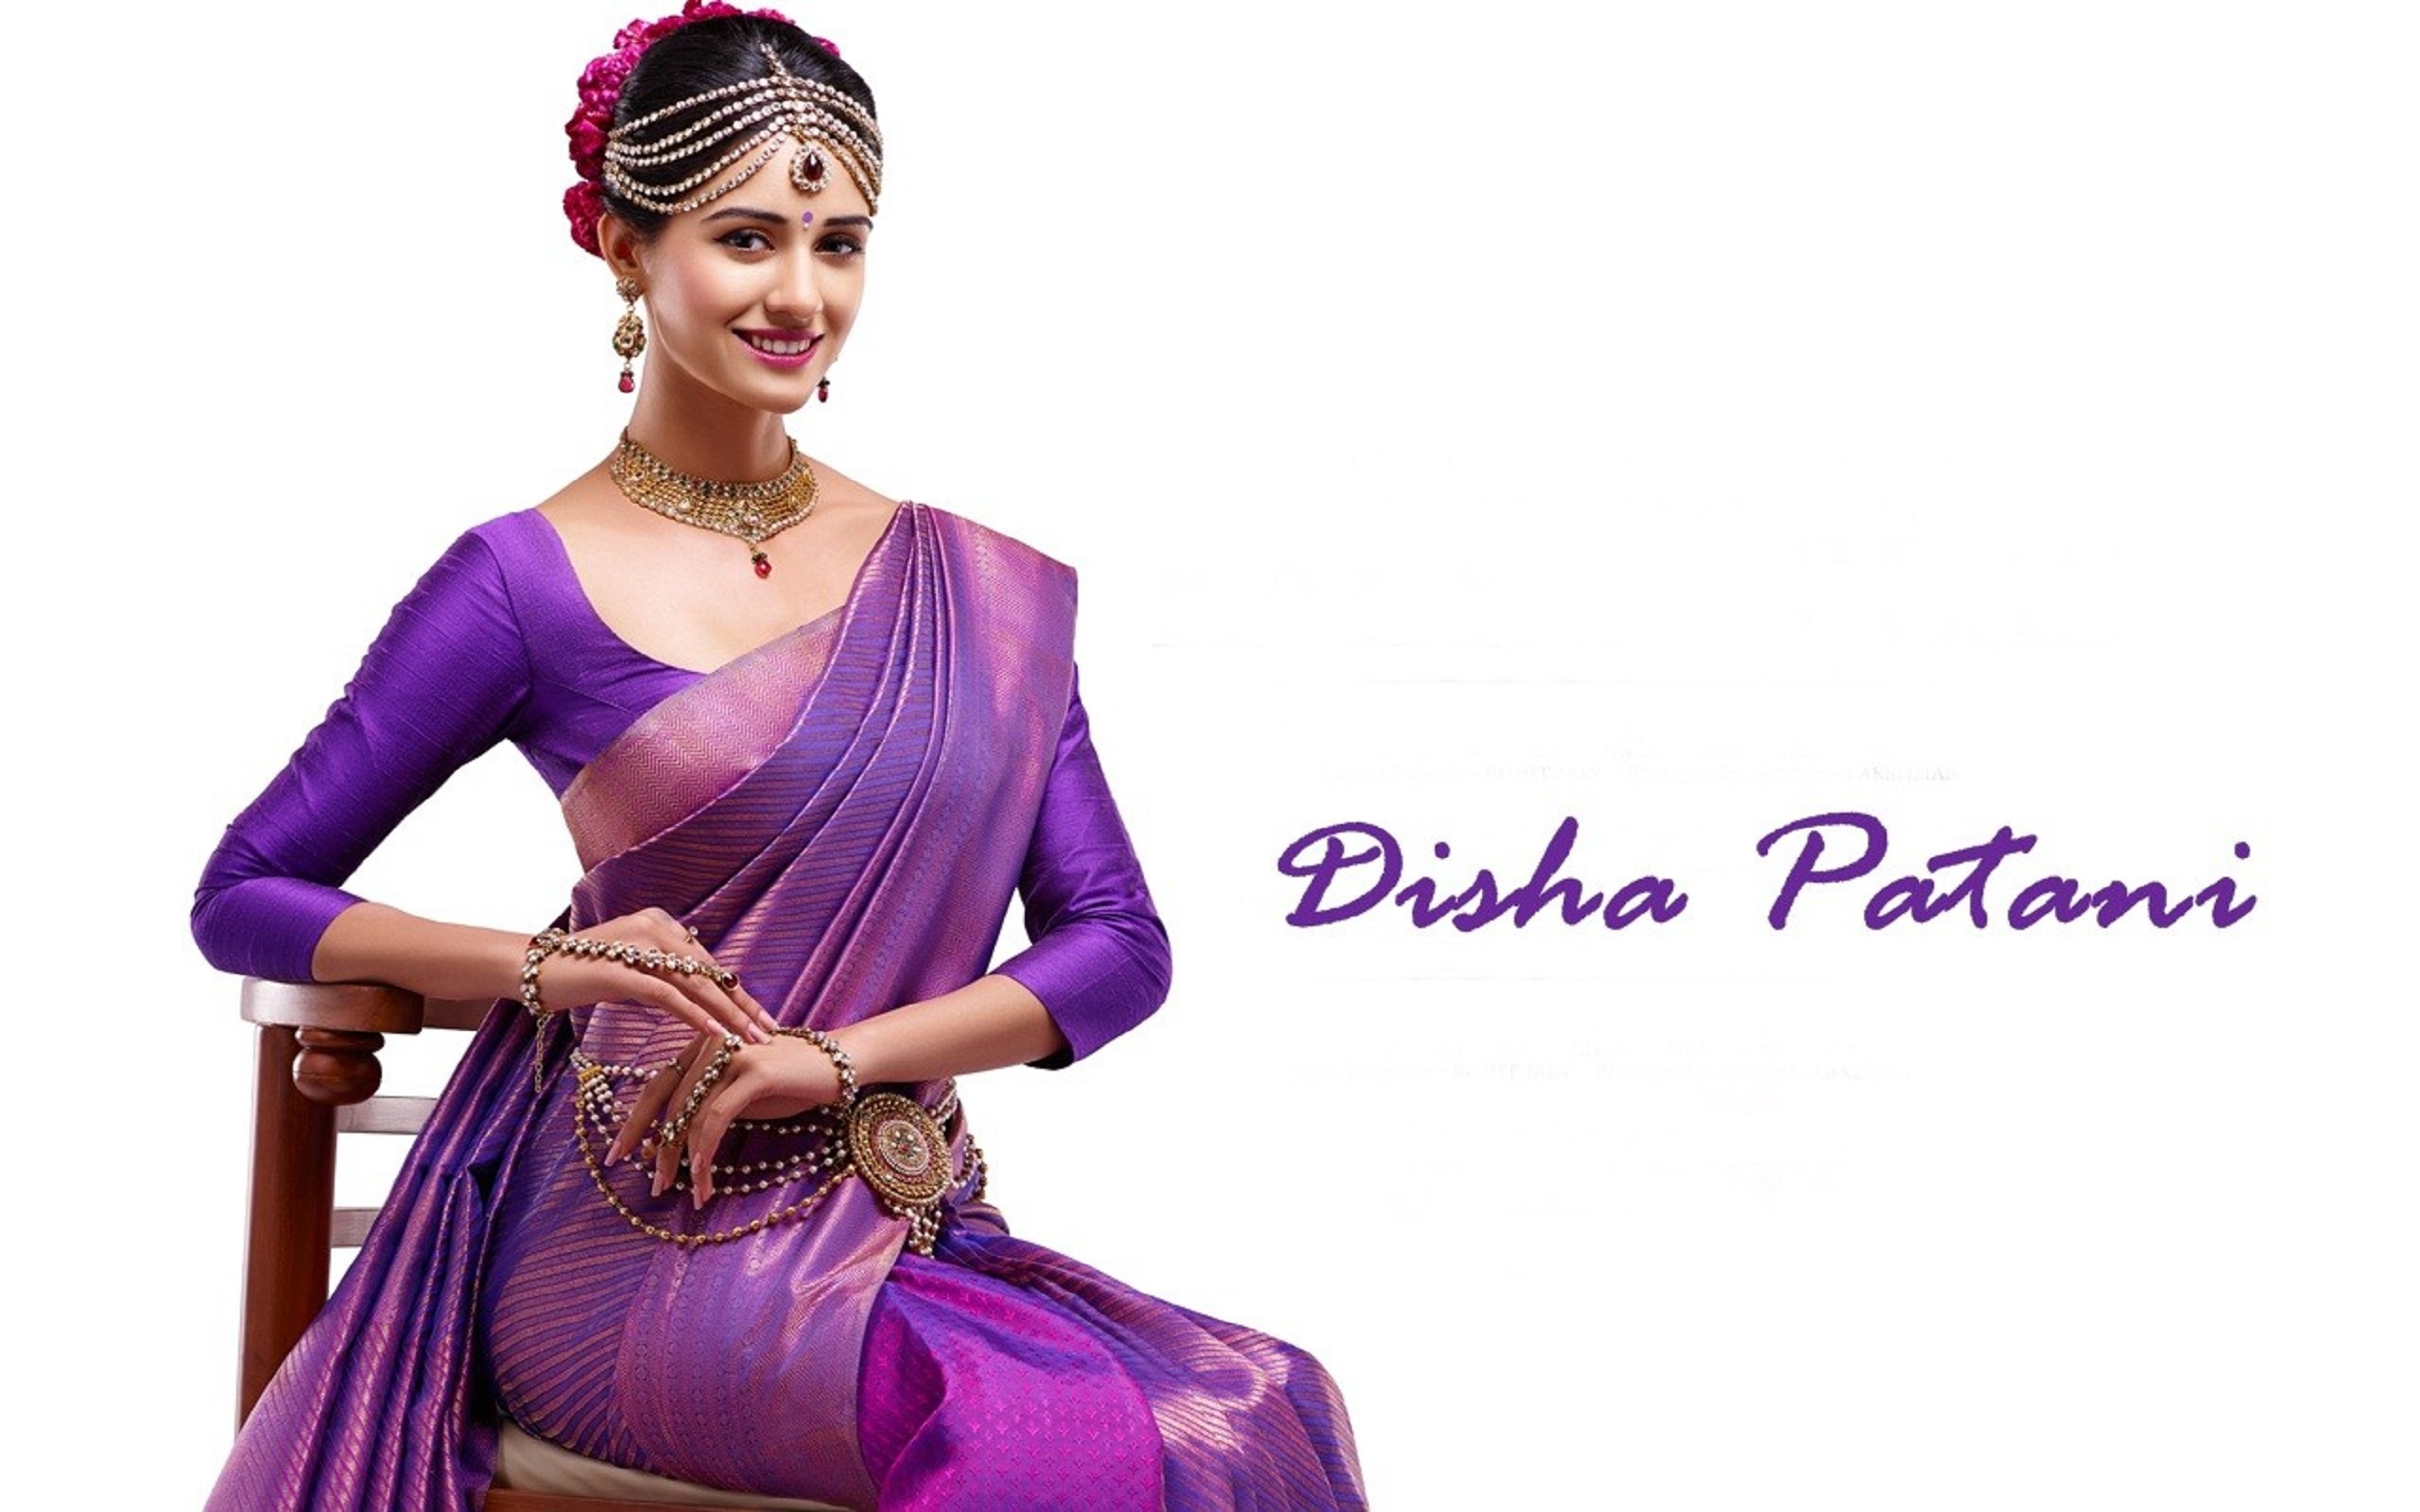 Disha Patani Images